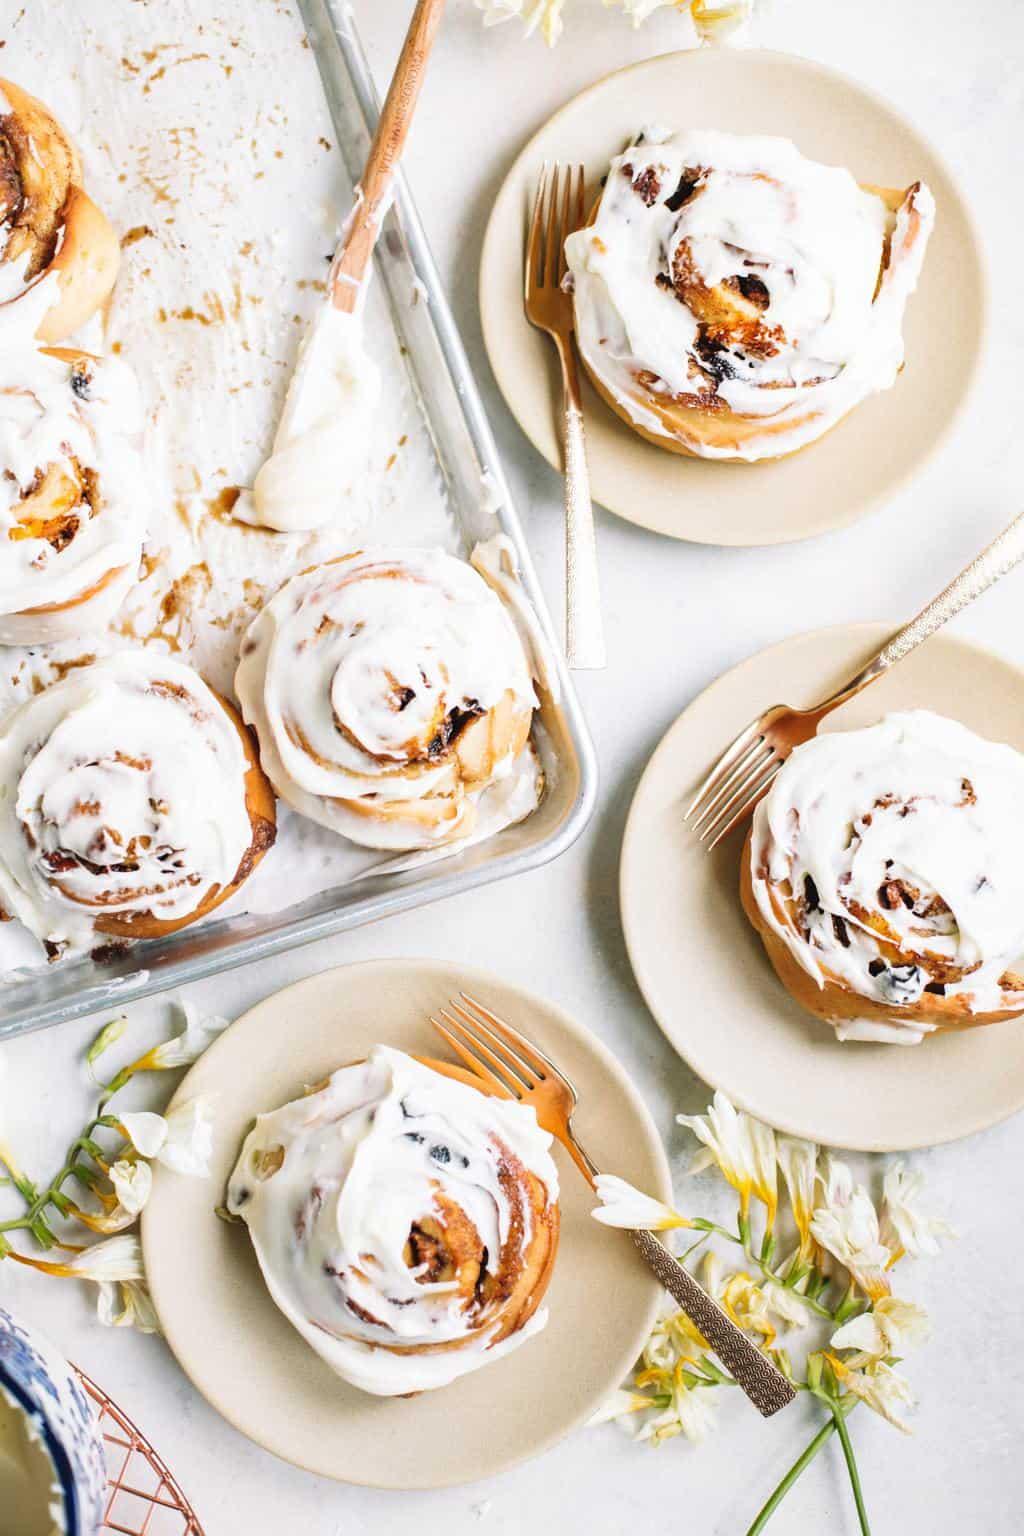 cream cheese glazed cinnamon buns on baking sheet and beige plates